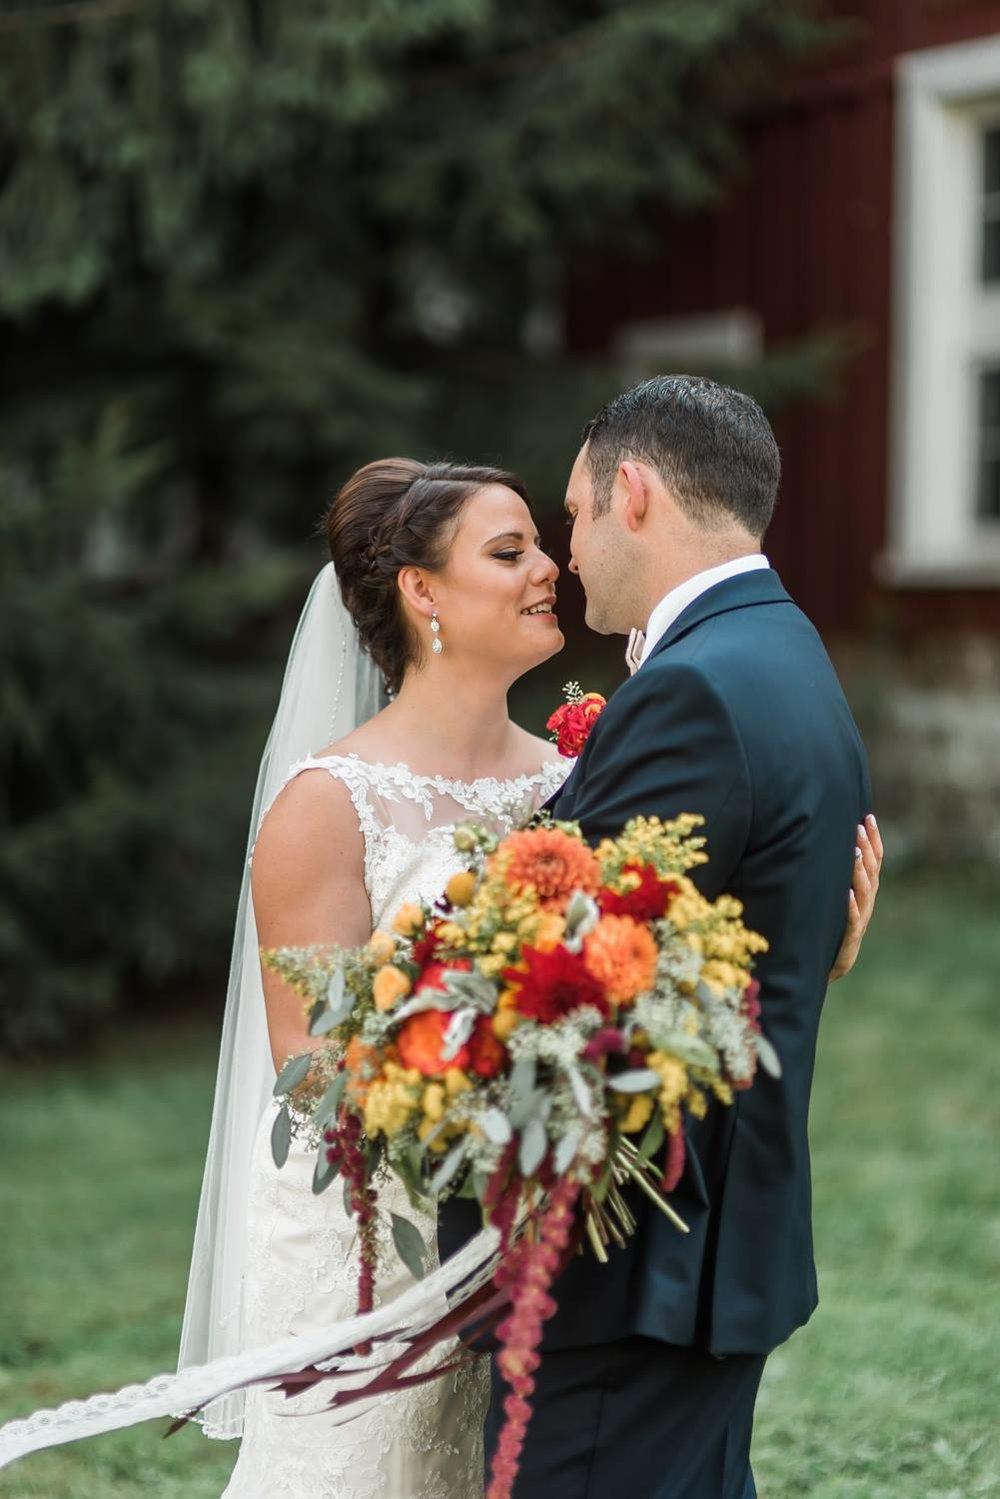 succop-conservancy-pennsylvania-outdoor-glam-jewel-tone-fall-autumn-wedding-0018.jpg